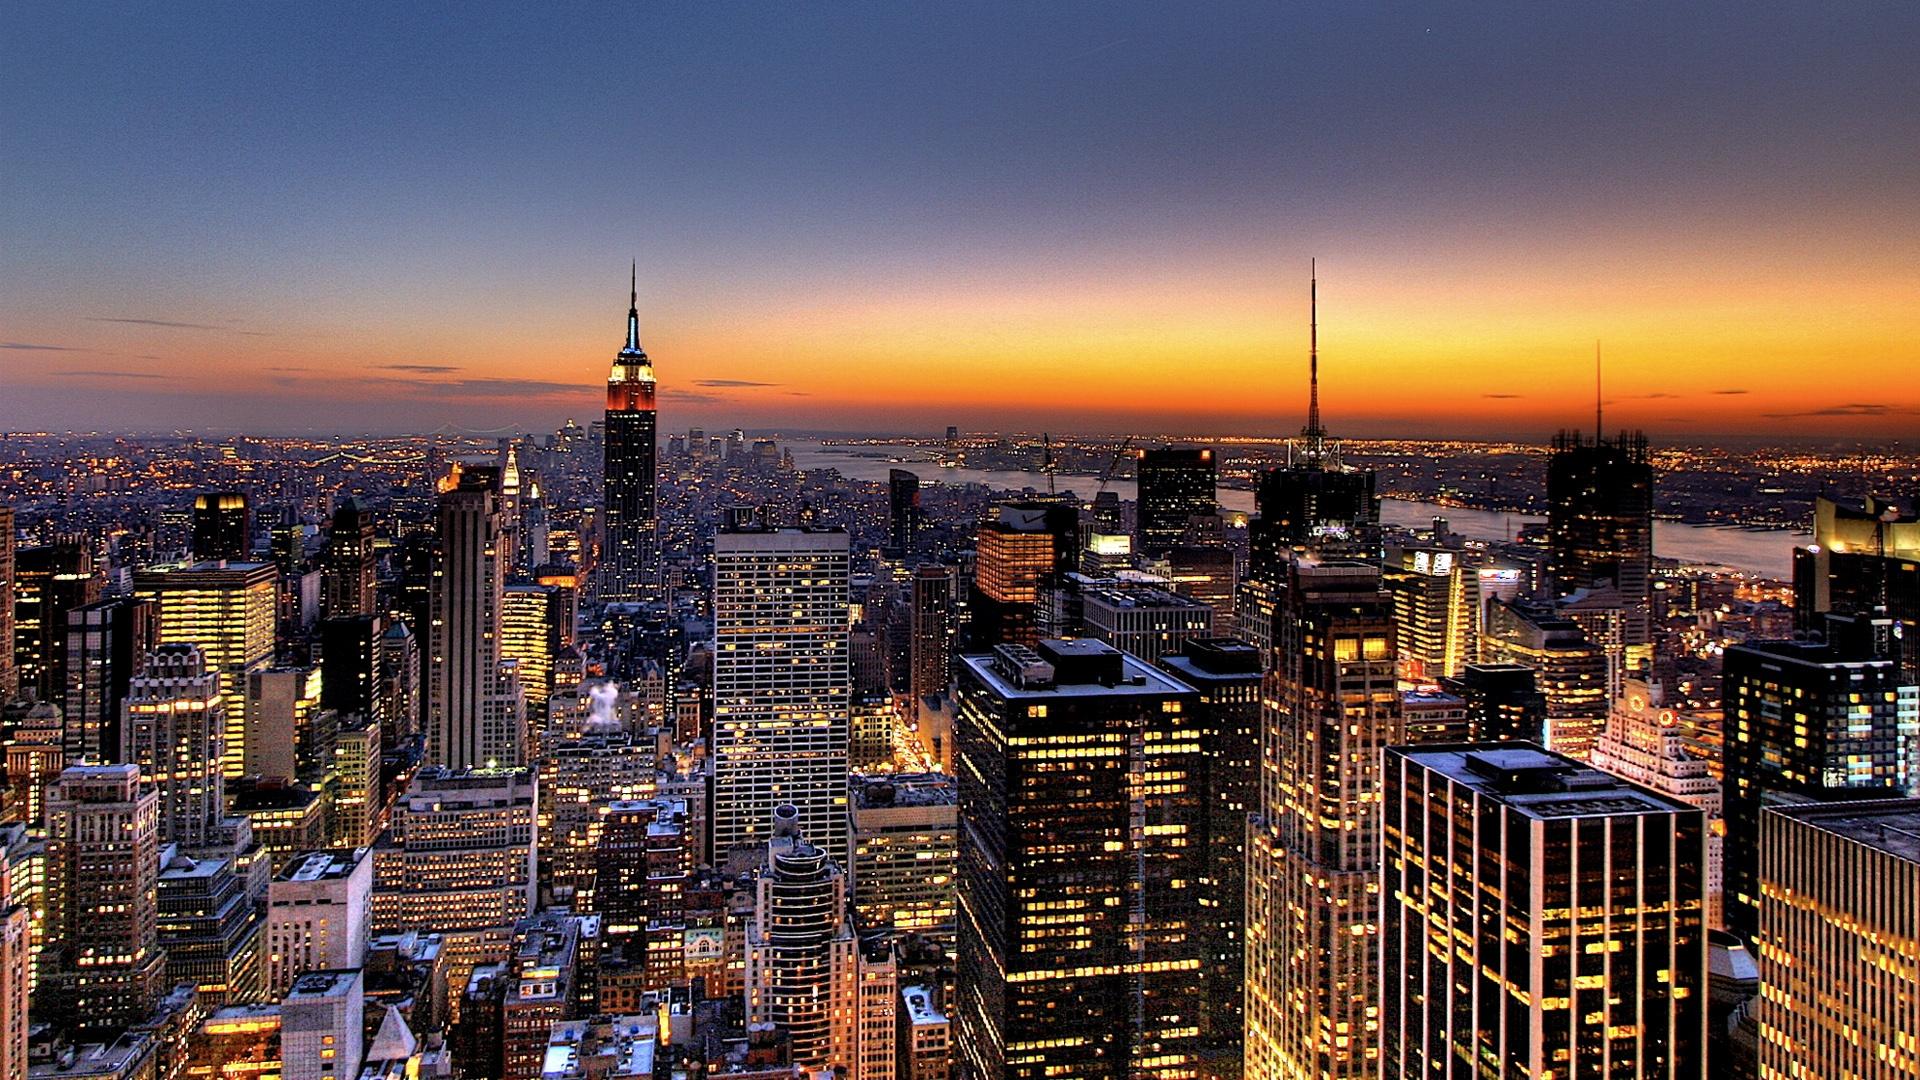 New York Skyline Wallpapers HD Wallpapers 1920x1080